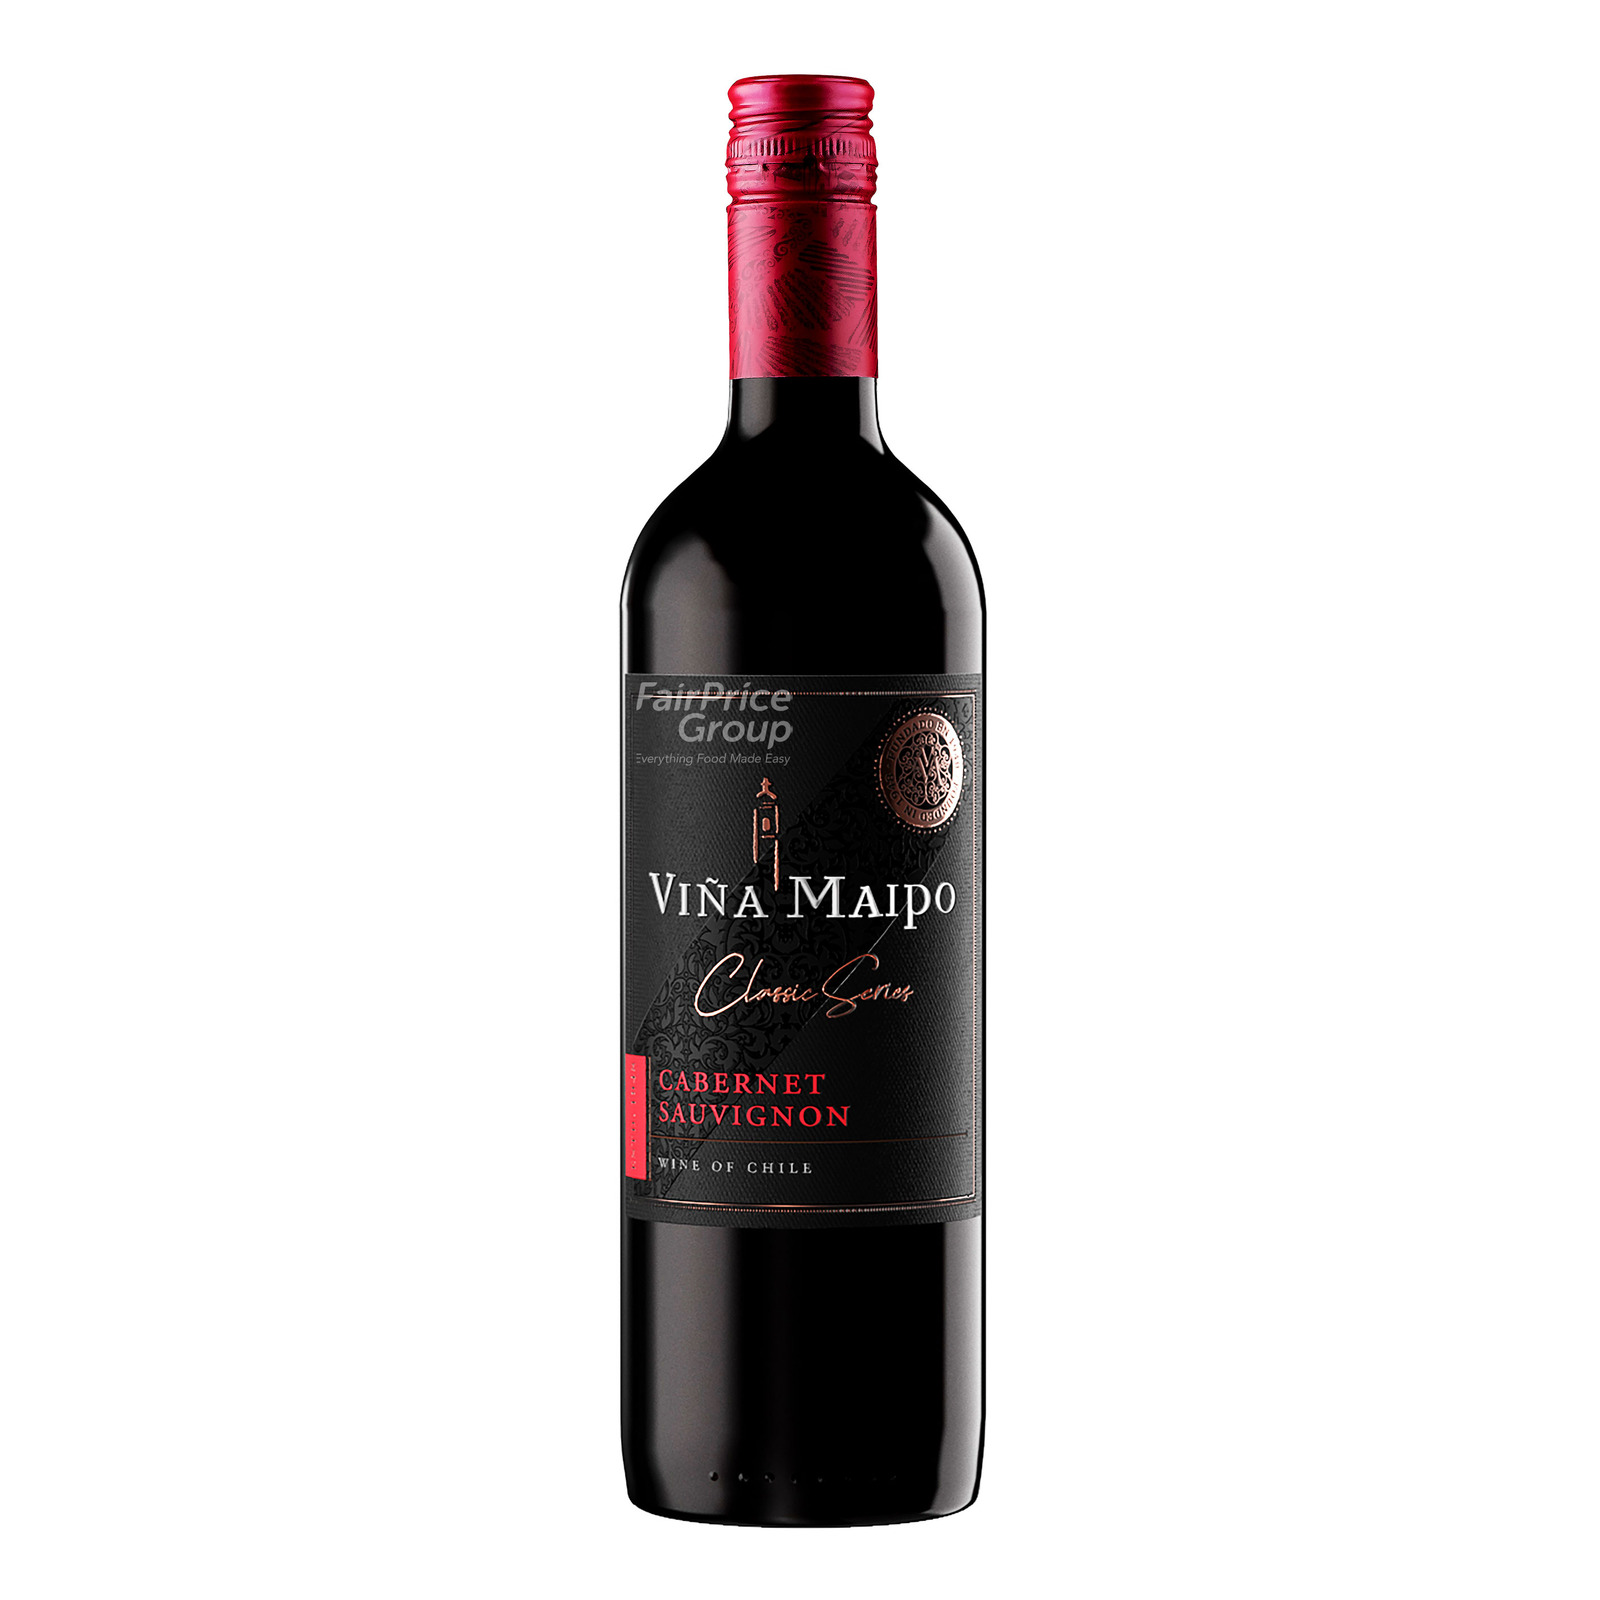 Vina Maipo Red Wine - Cabernet Sauvignon Merlot